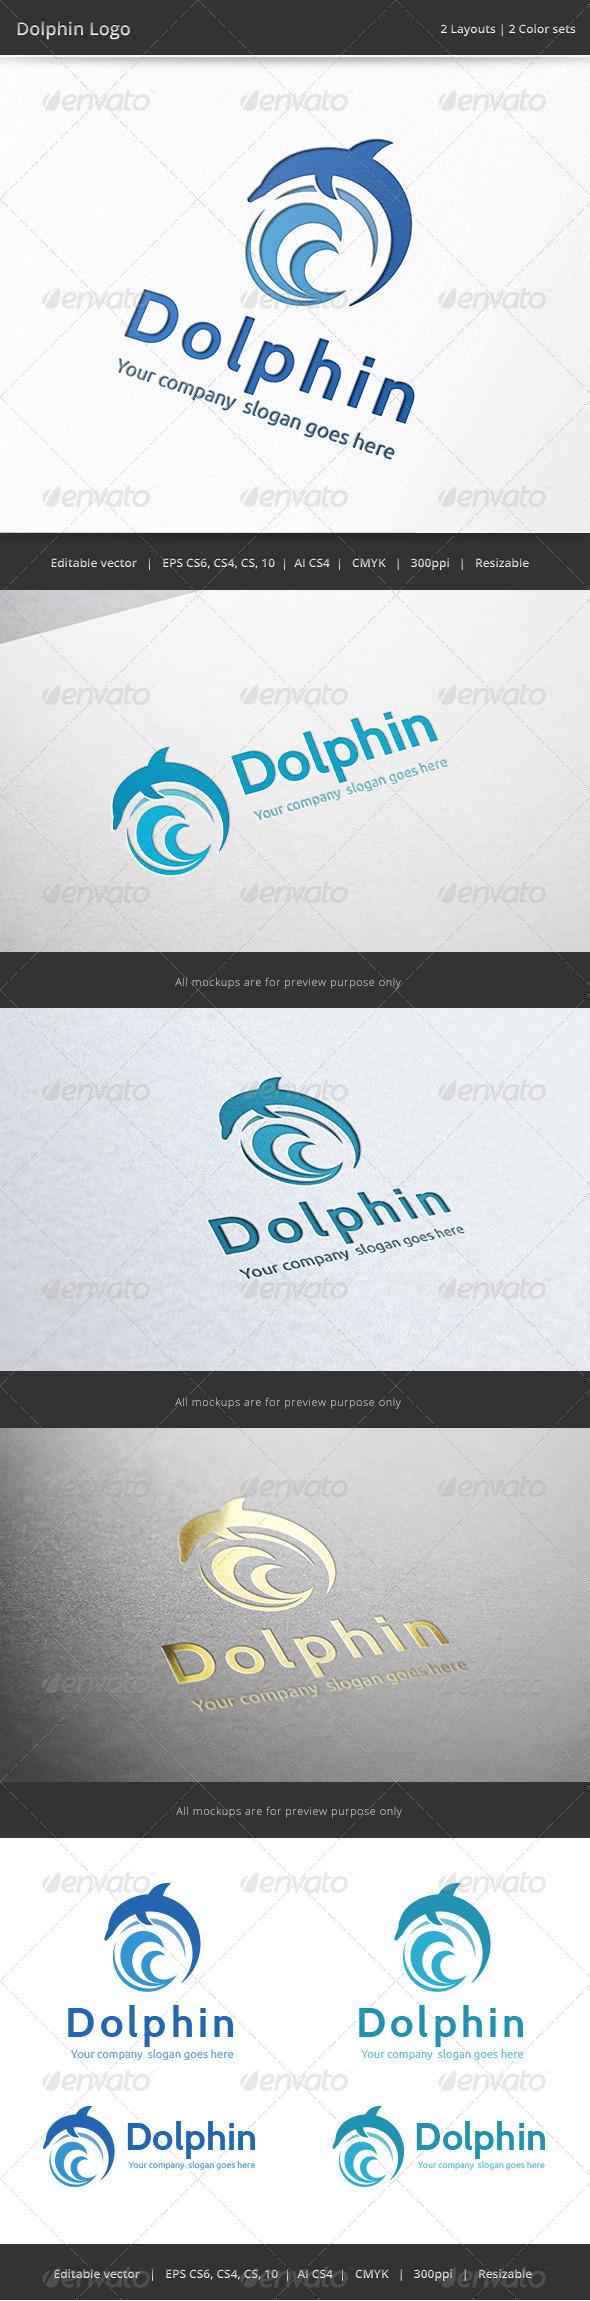 GraphicRiver Dolphin Logo 6904609